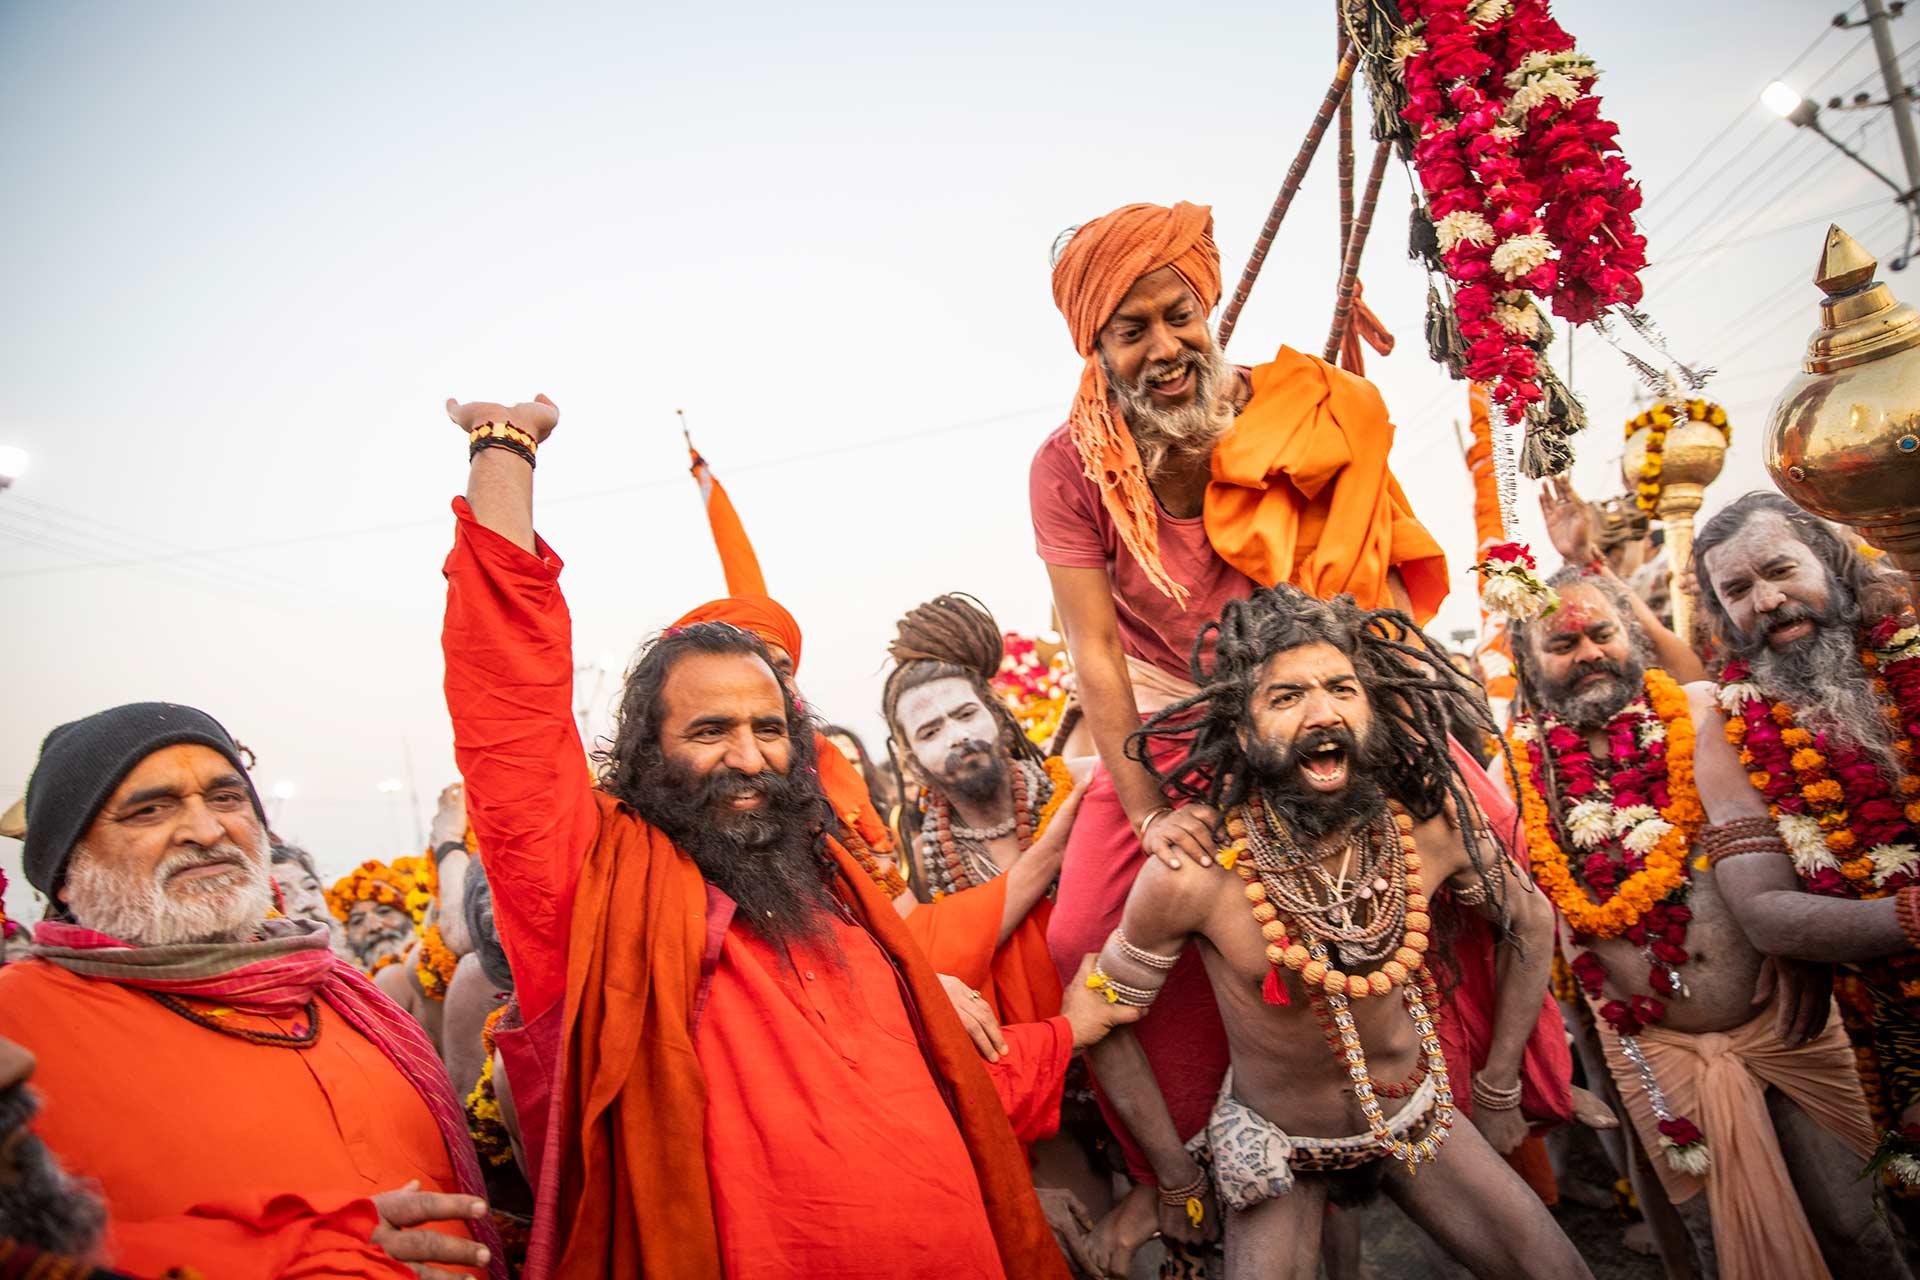 india-kumbh-mela-viaje-fotografias